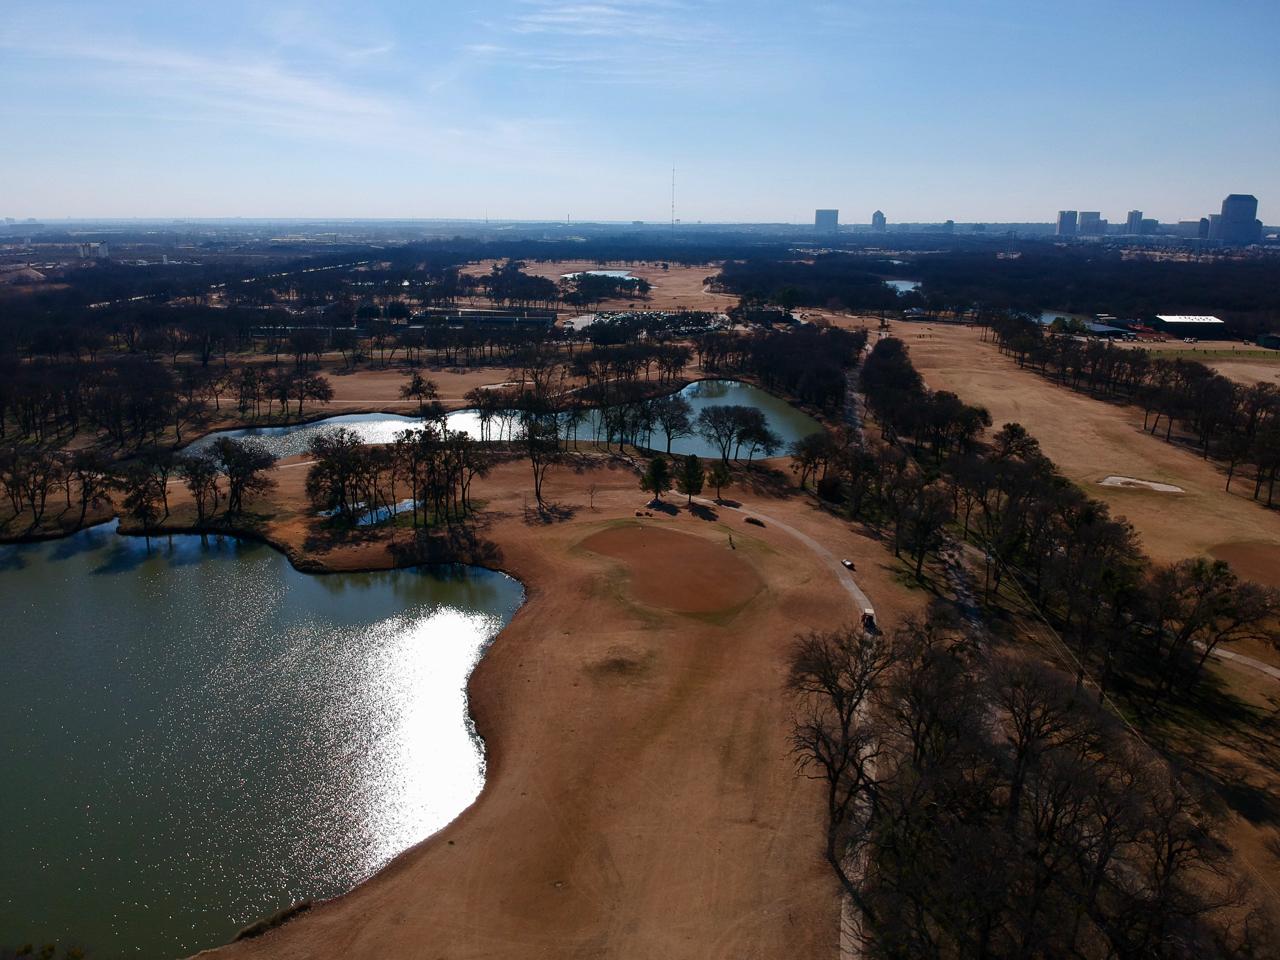 Status: Drone Golf Course